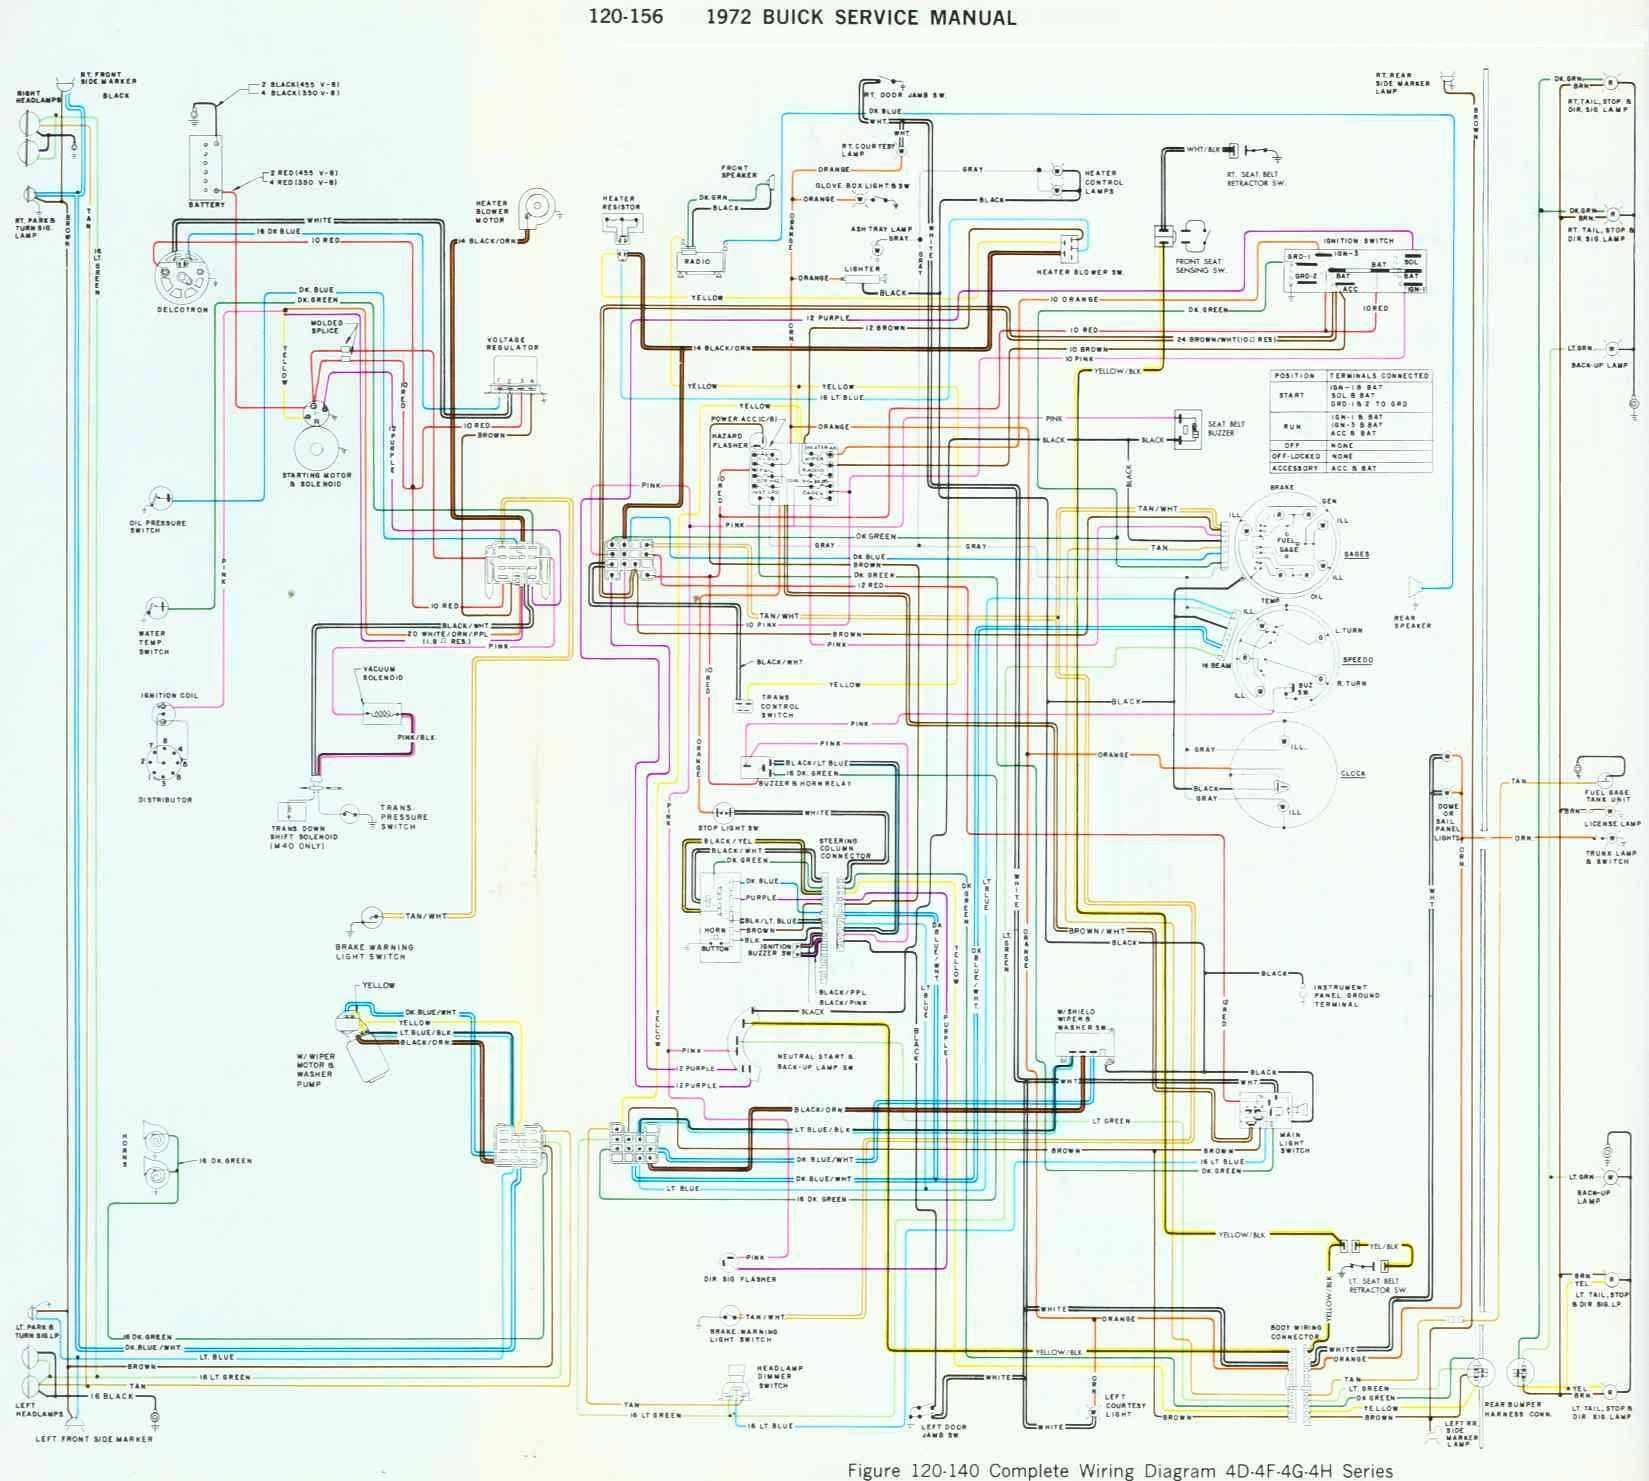 hight resolution of 1952 plymouth cranbrook wiring diagram wiring library rh 14 codingcommunity de 1968 dodge dart wiring